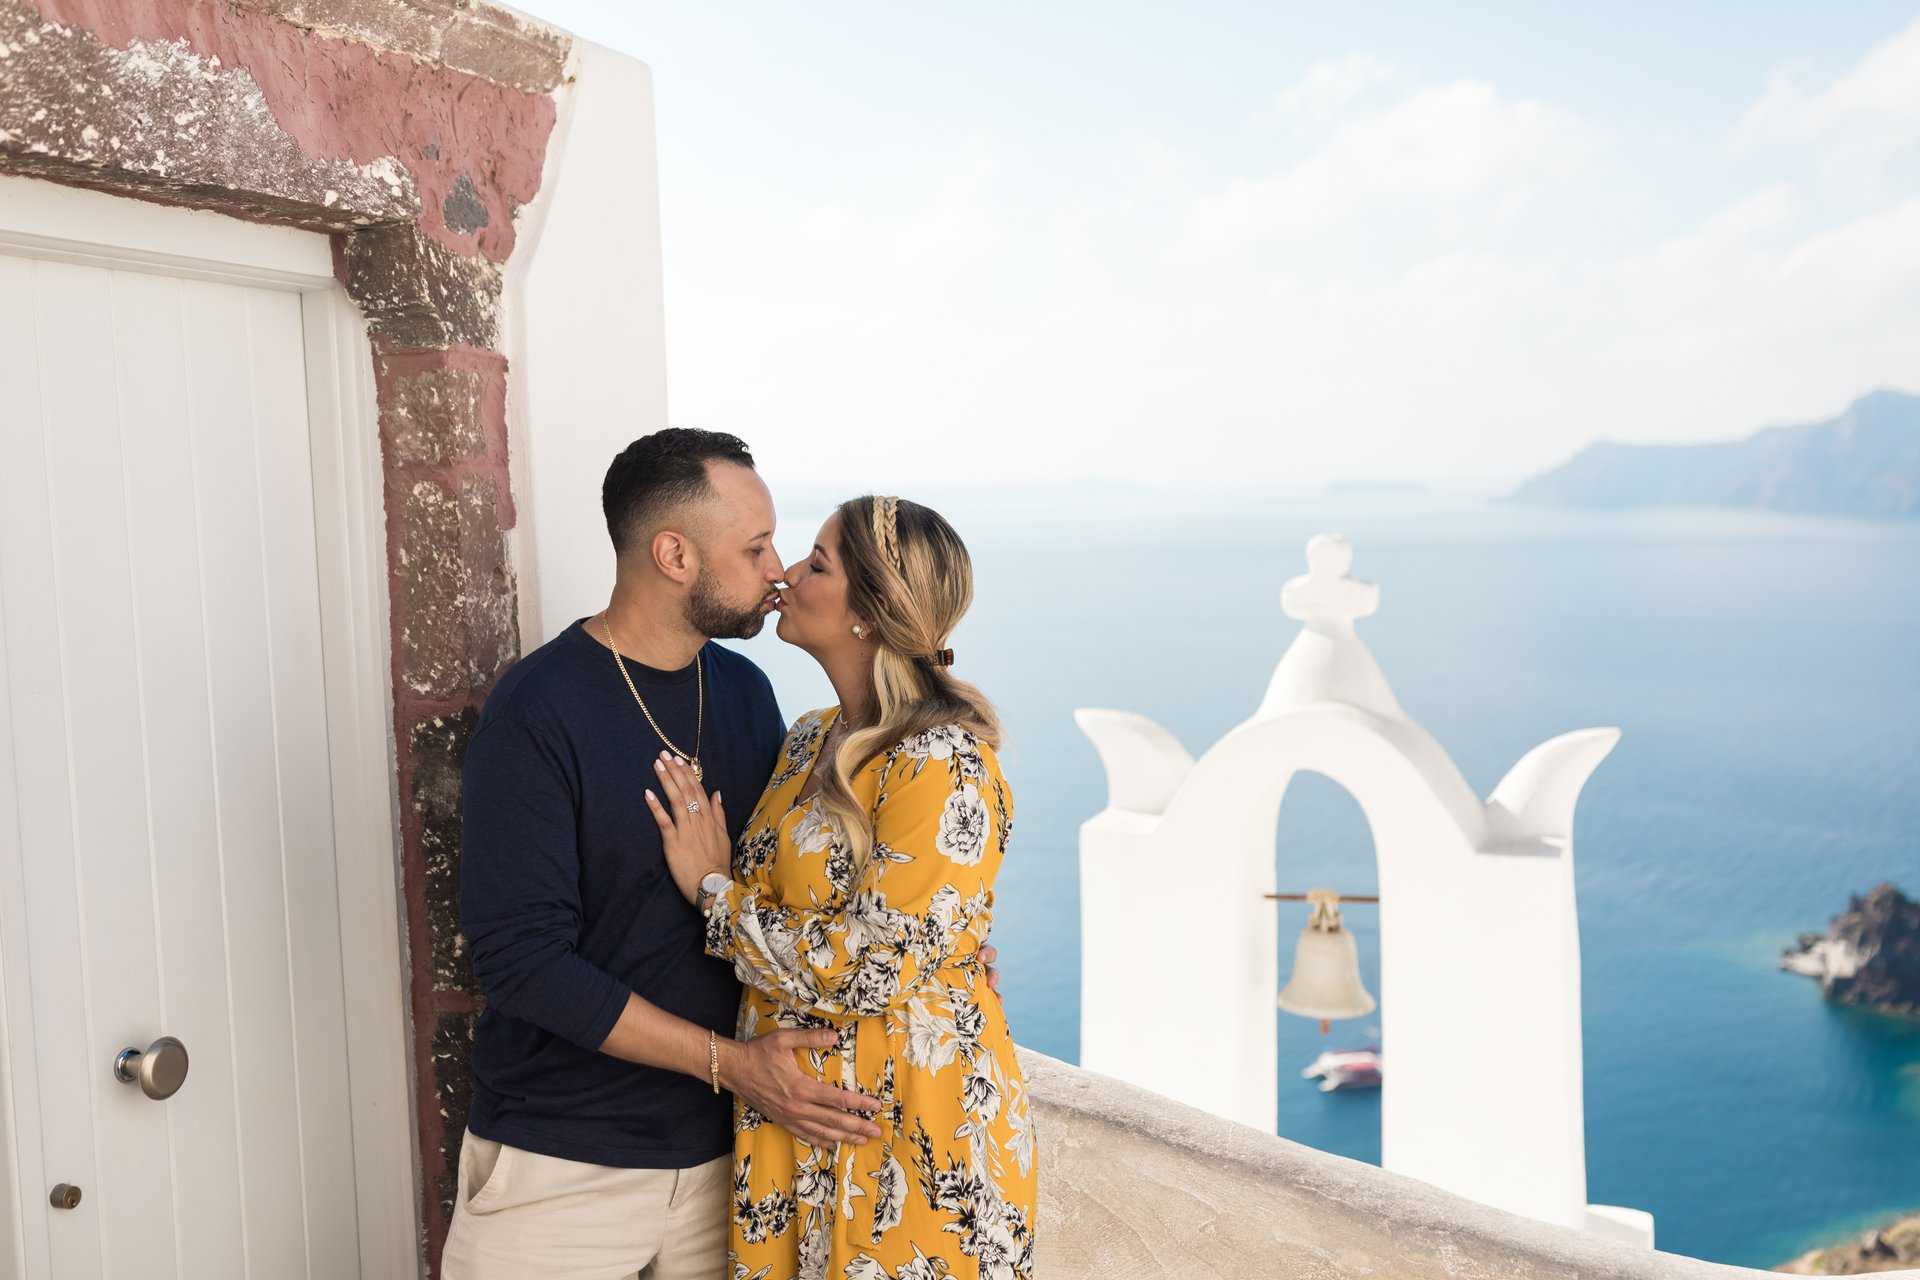 Santorini-Greece-travel-story-Flytographer-12